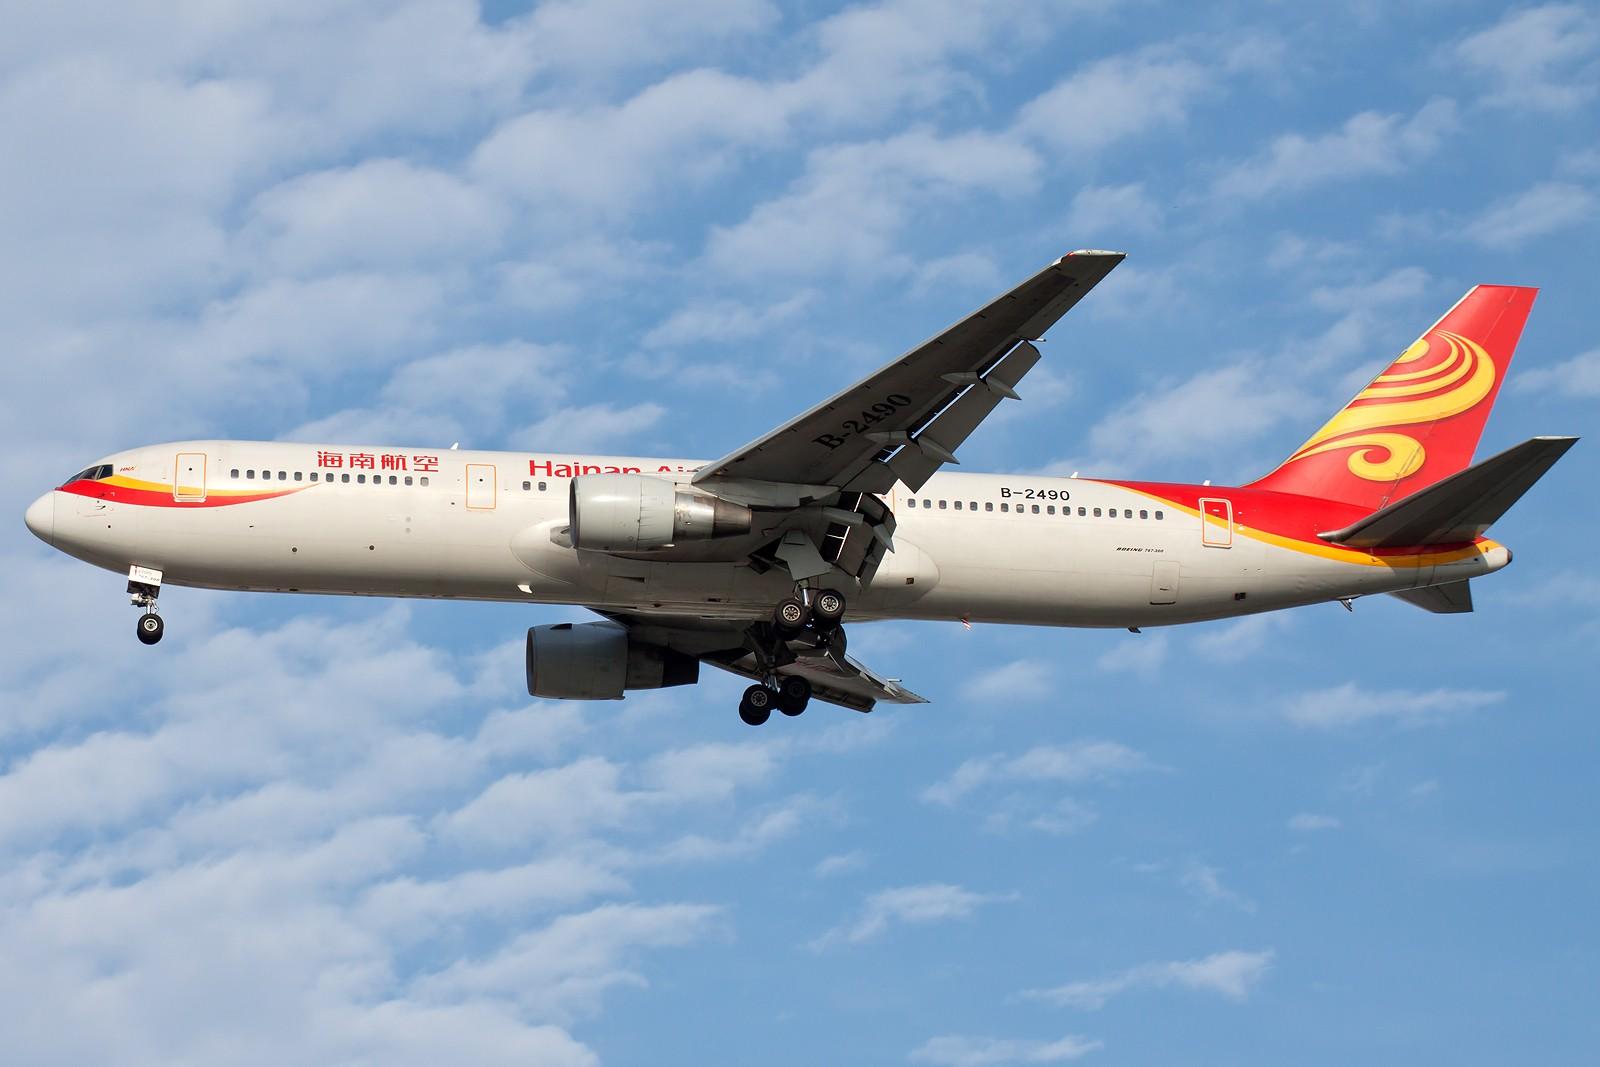 Re:[原创]求好天儿... [10pics] BOEING 767-300 B-2490 中国北京首都国际机场